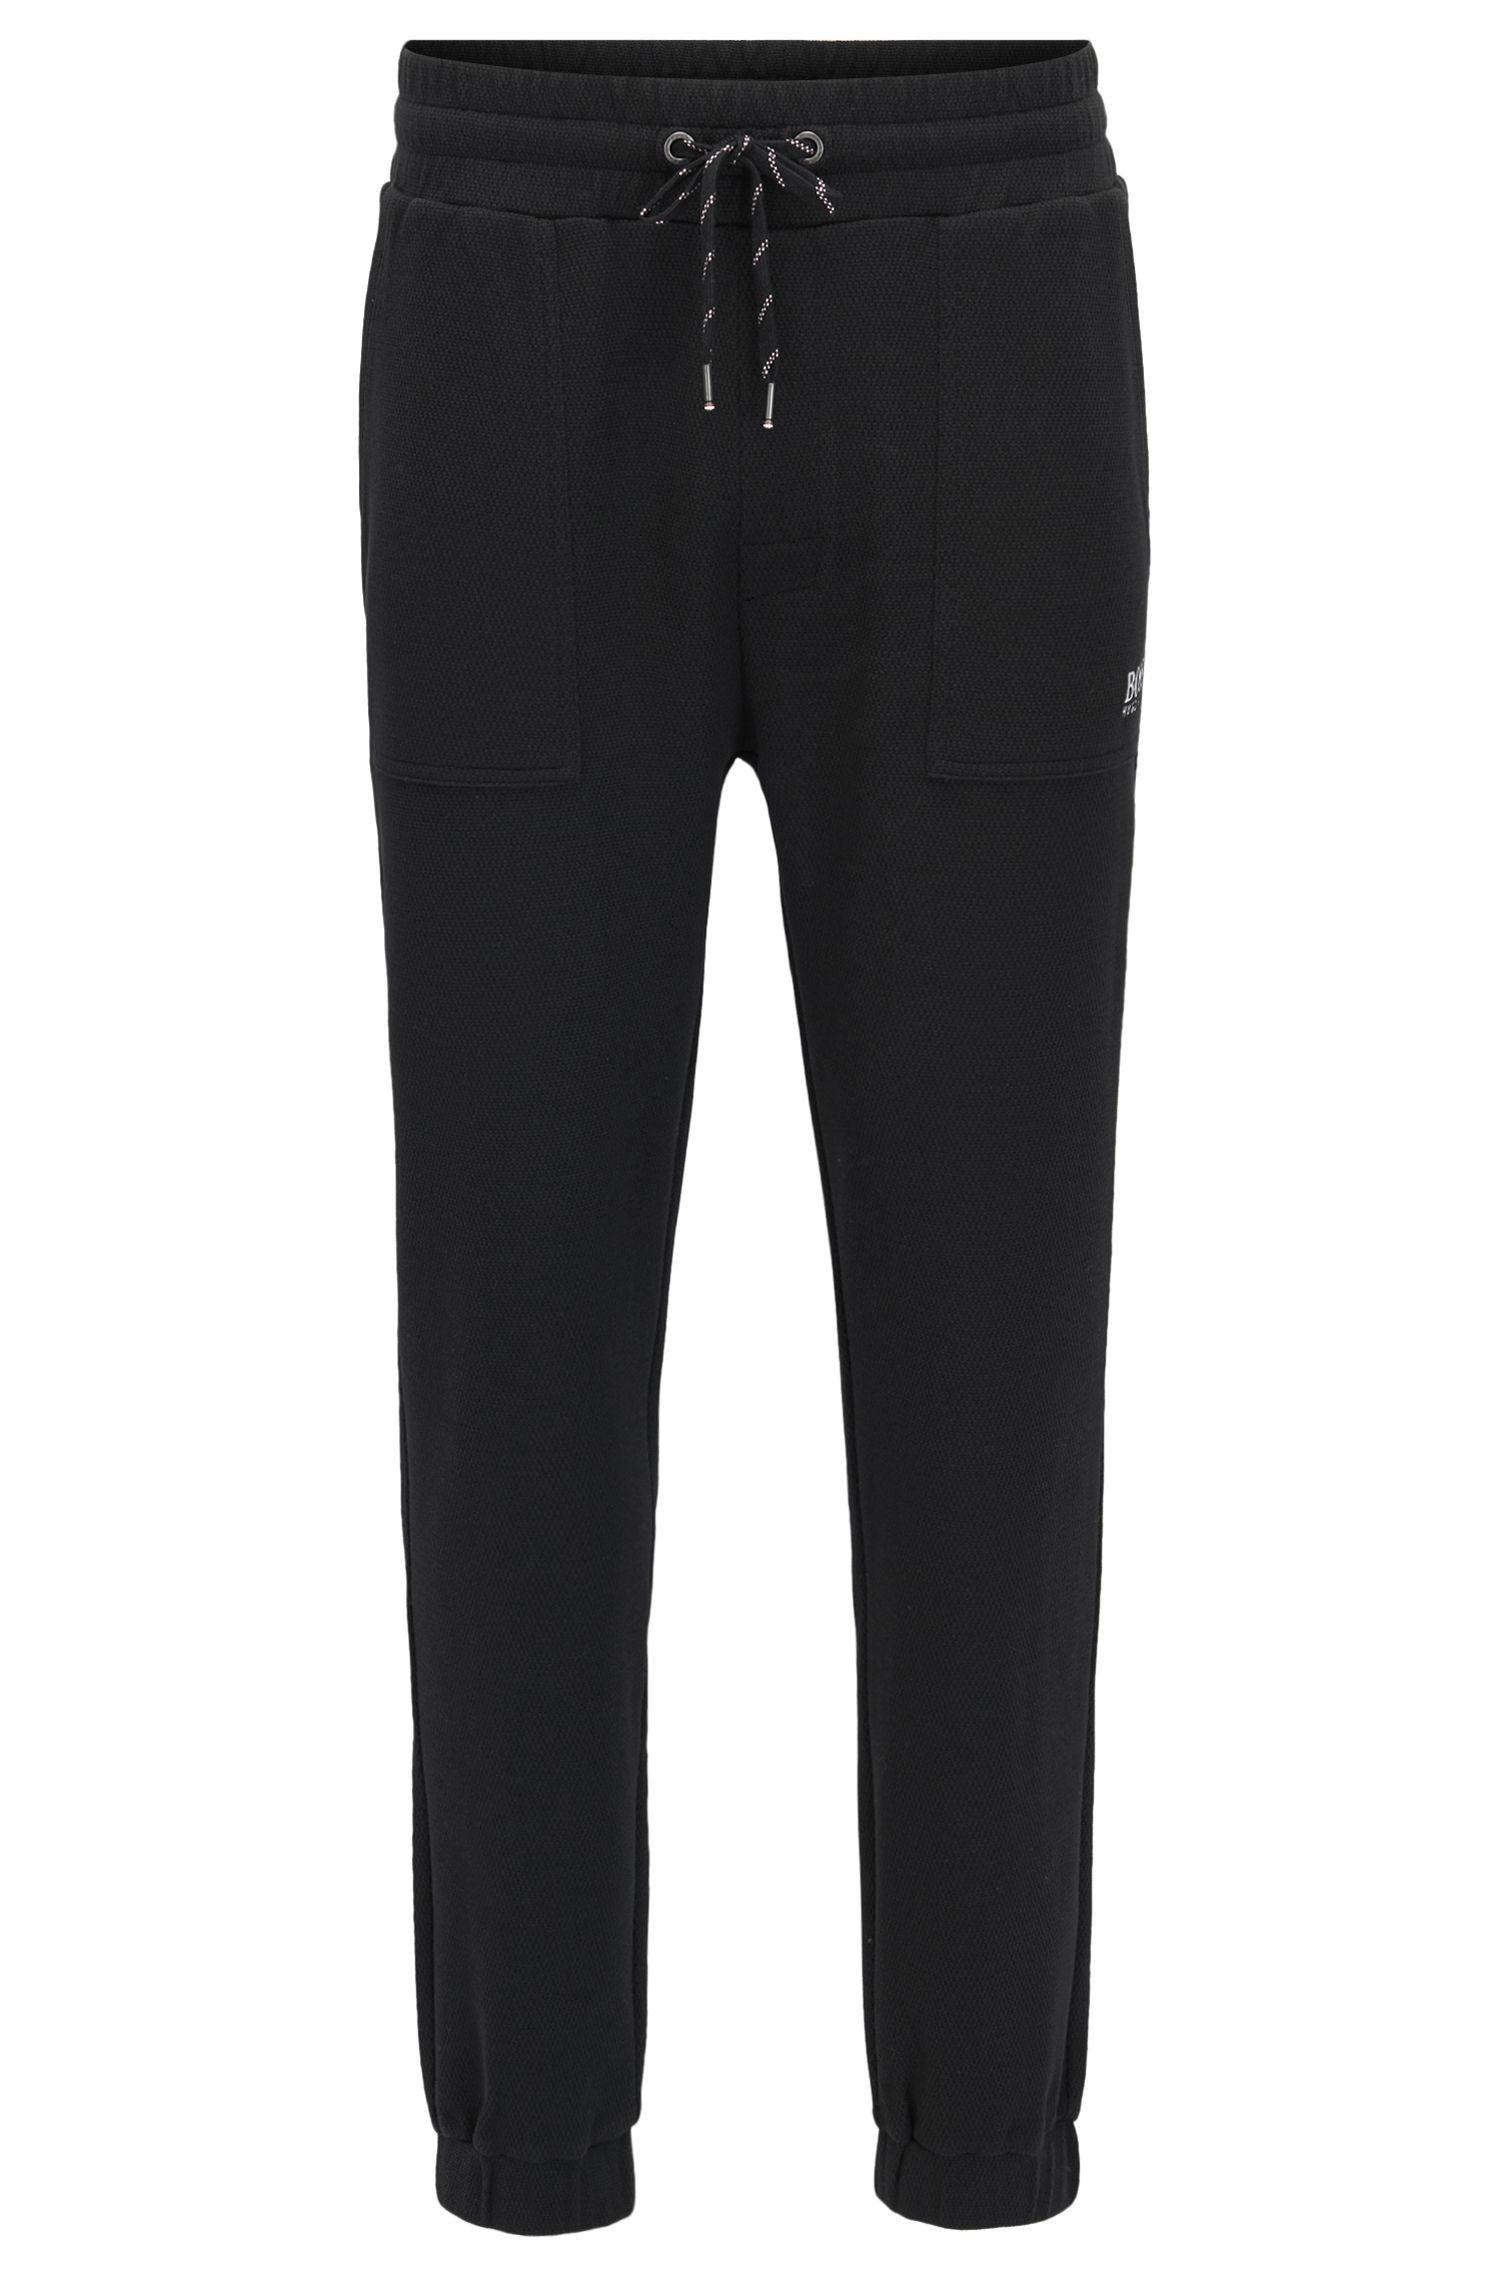 Cuffed loungewear trousers in cotton-blend piqué